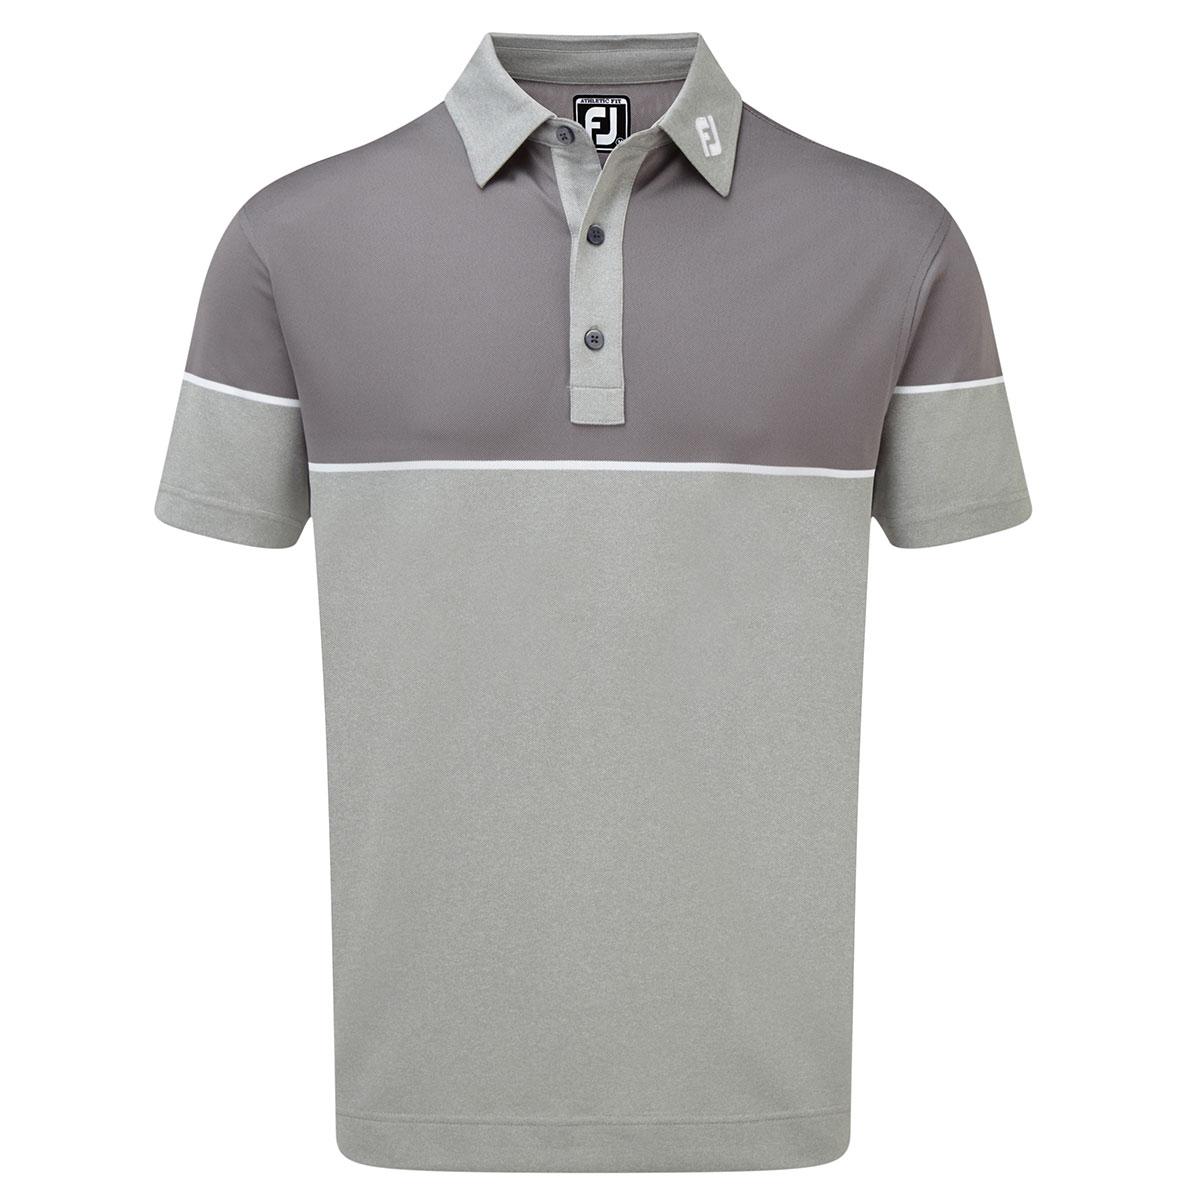 cb0f3239 FootJoy Colour Block Pique Polo Shirt from american golf